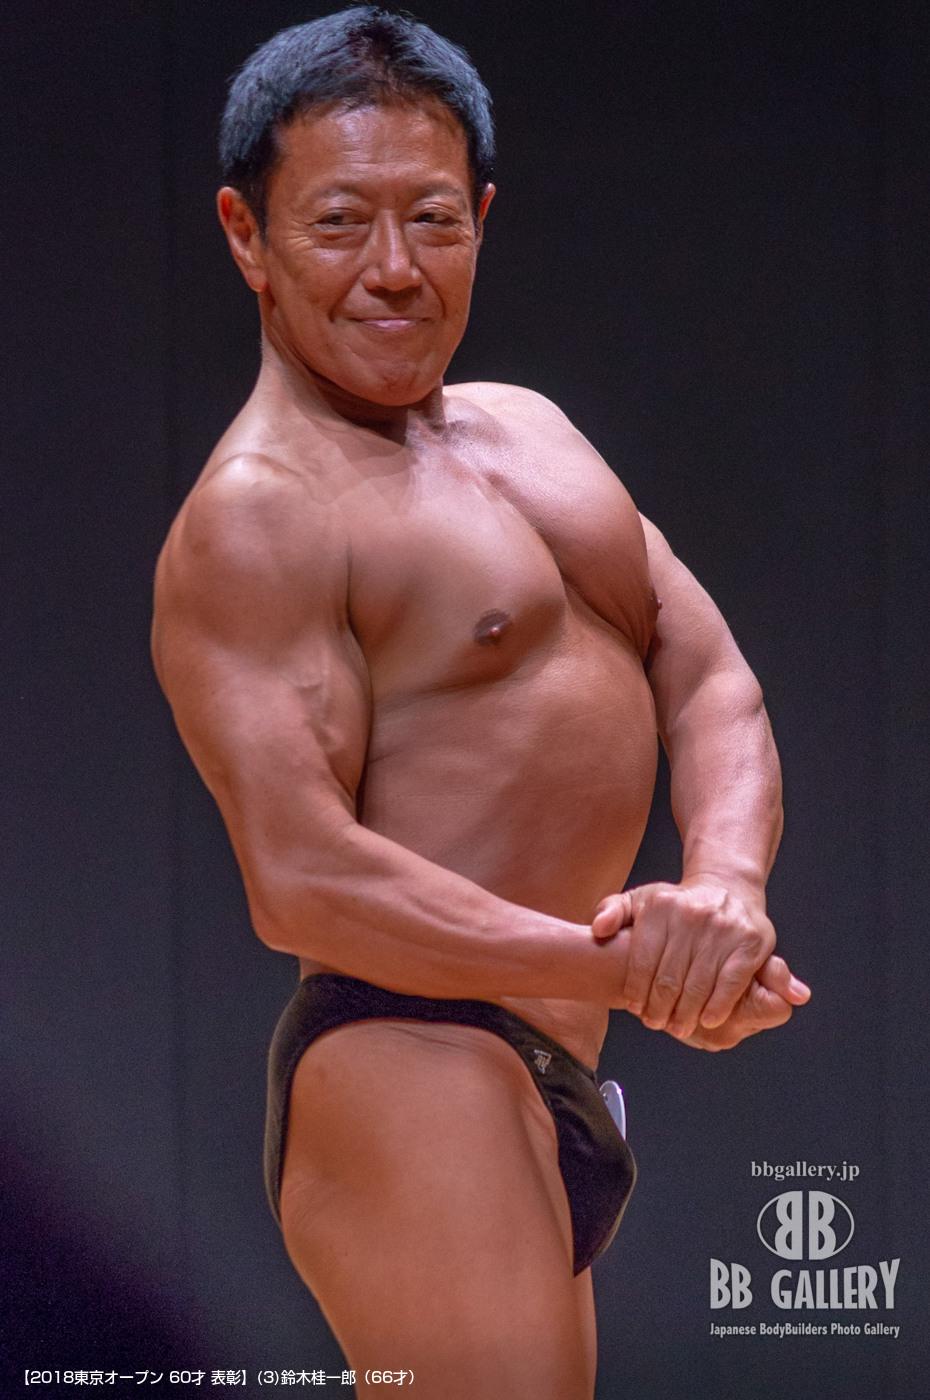 【2018東京オープン 60才 表彰】(3)鈴木桂一郎(66才)